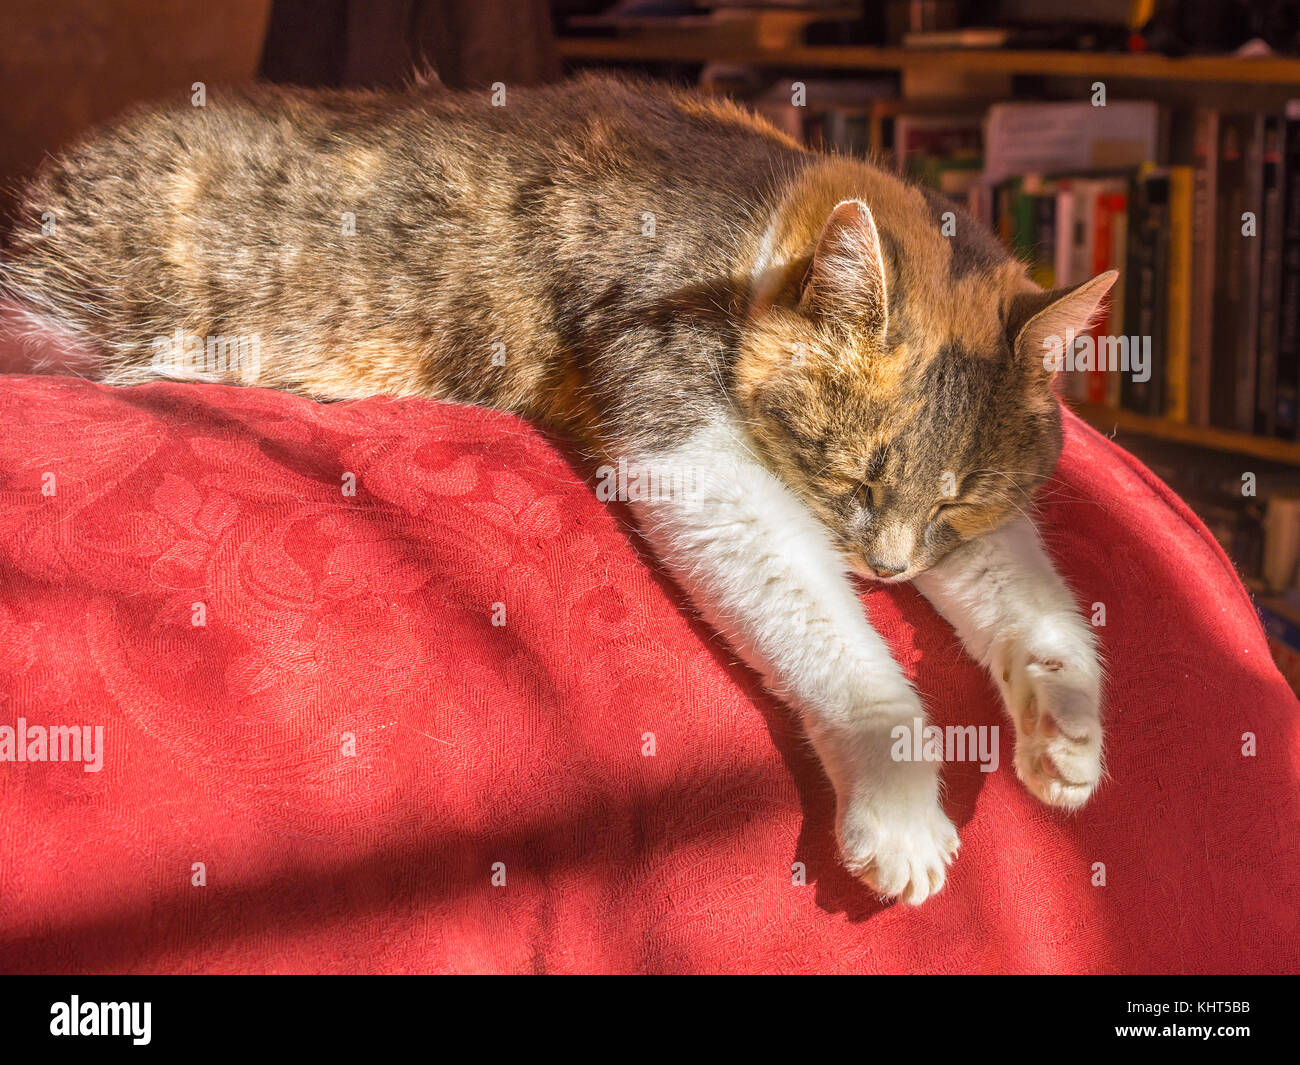 Cat sleeping on arm of sofa in warm sunlight. - Stock Image